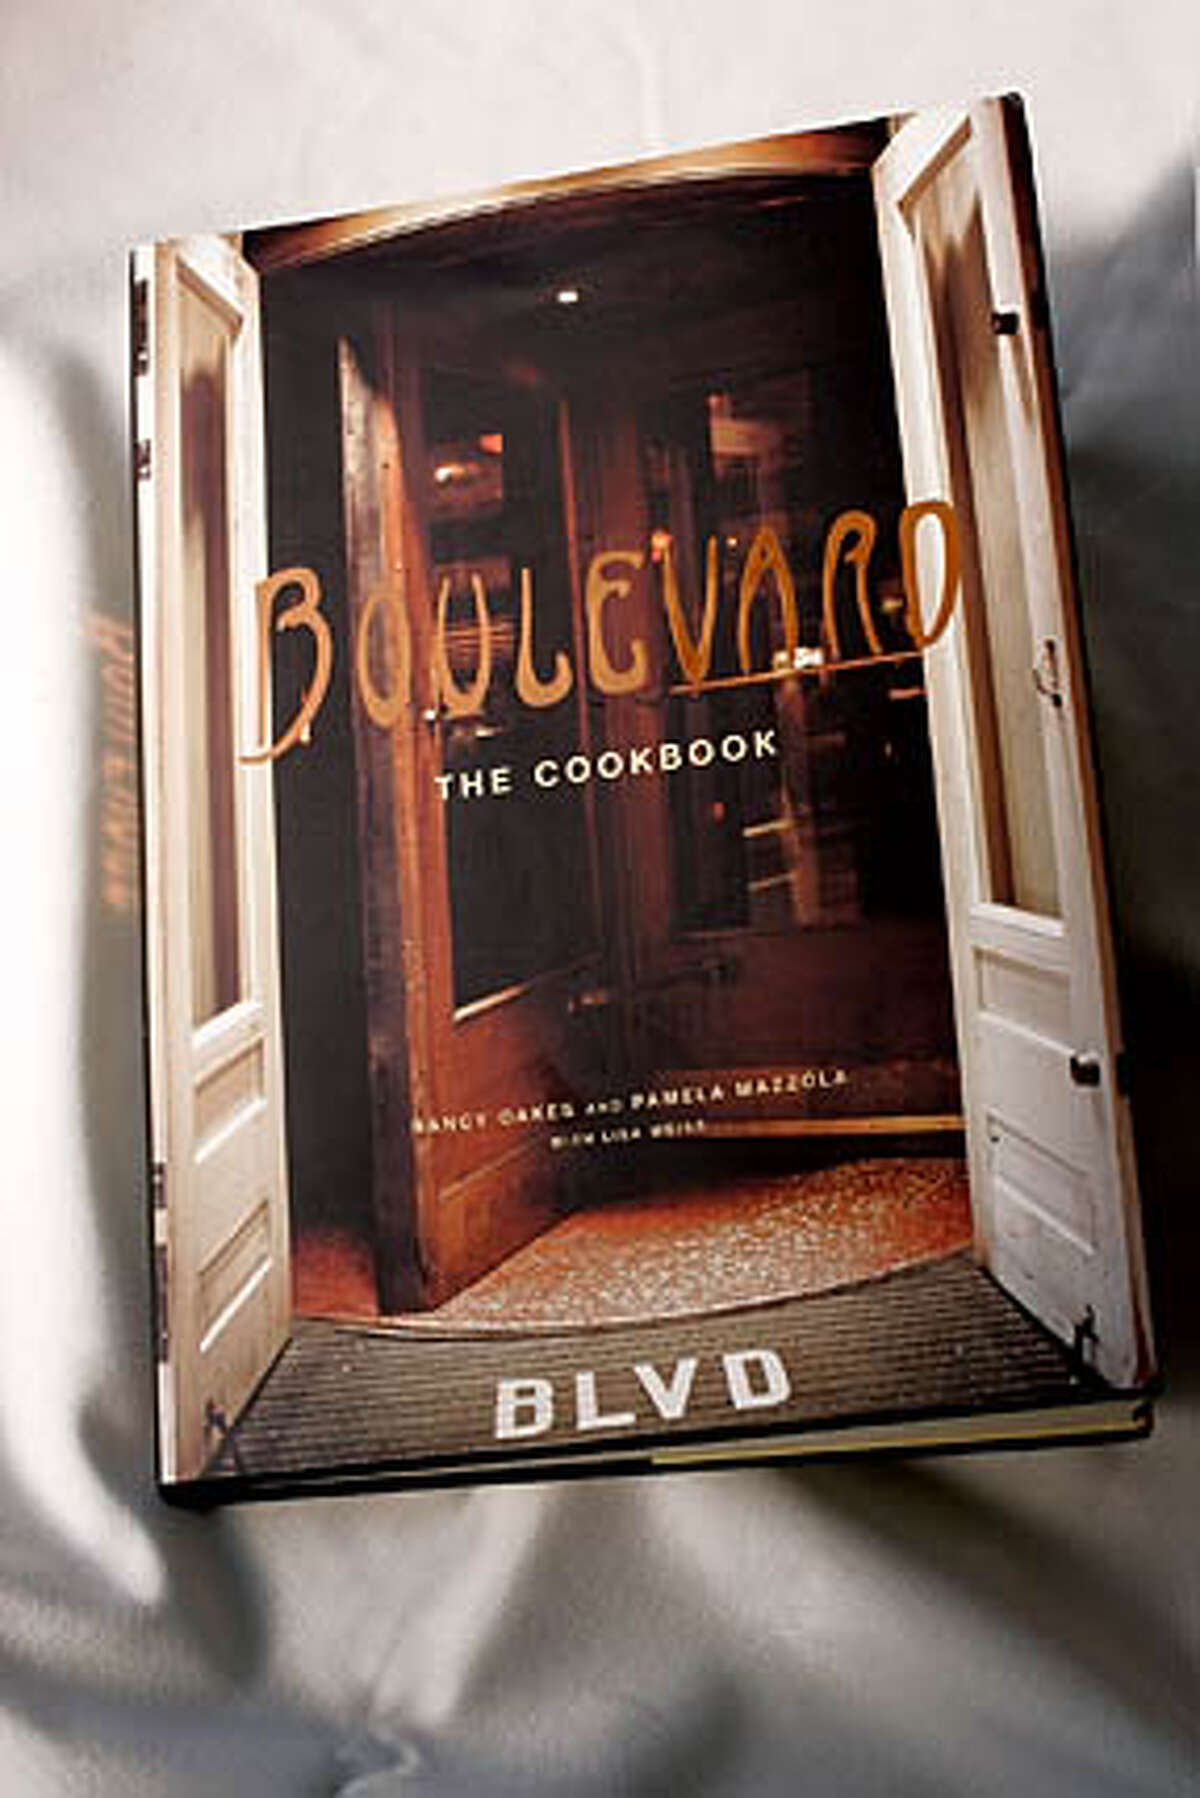 BOOK14_011_LH.JPG The cookbook